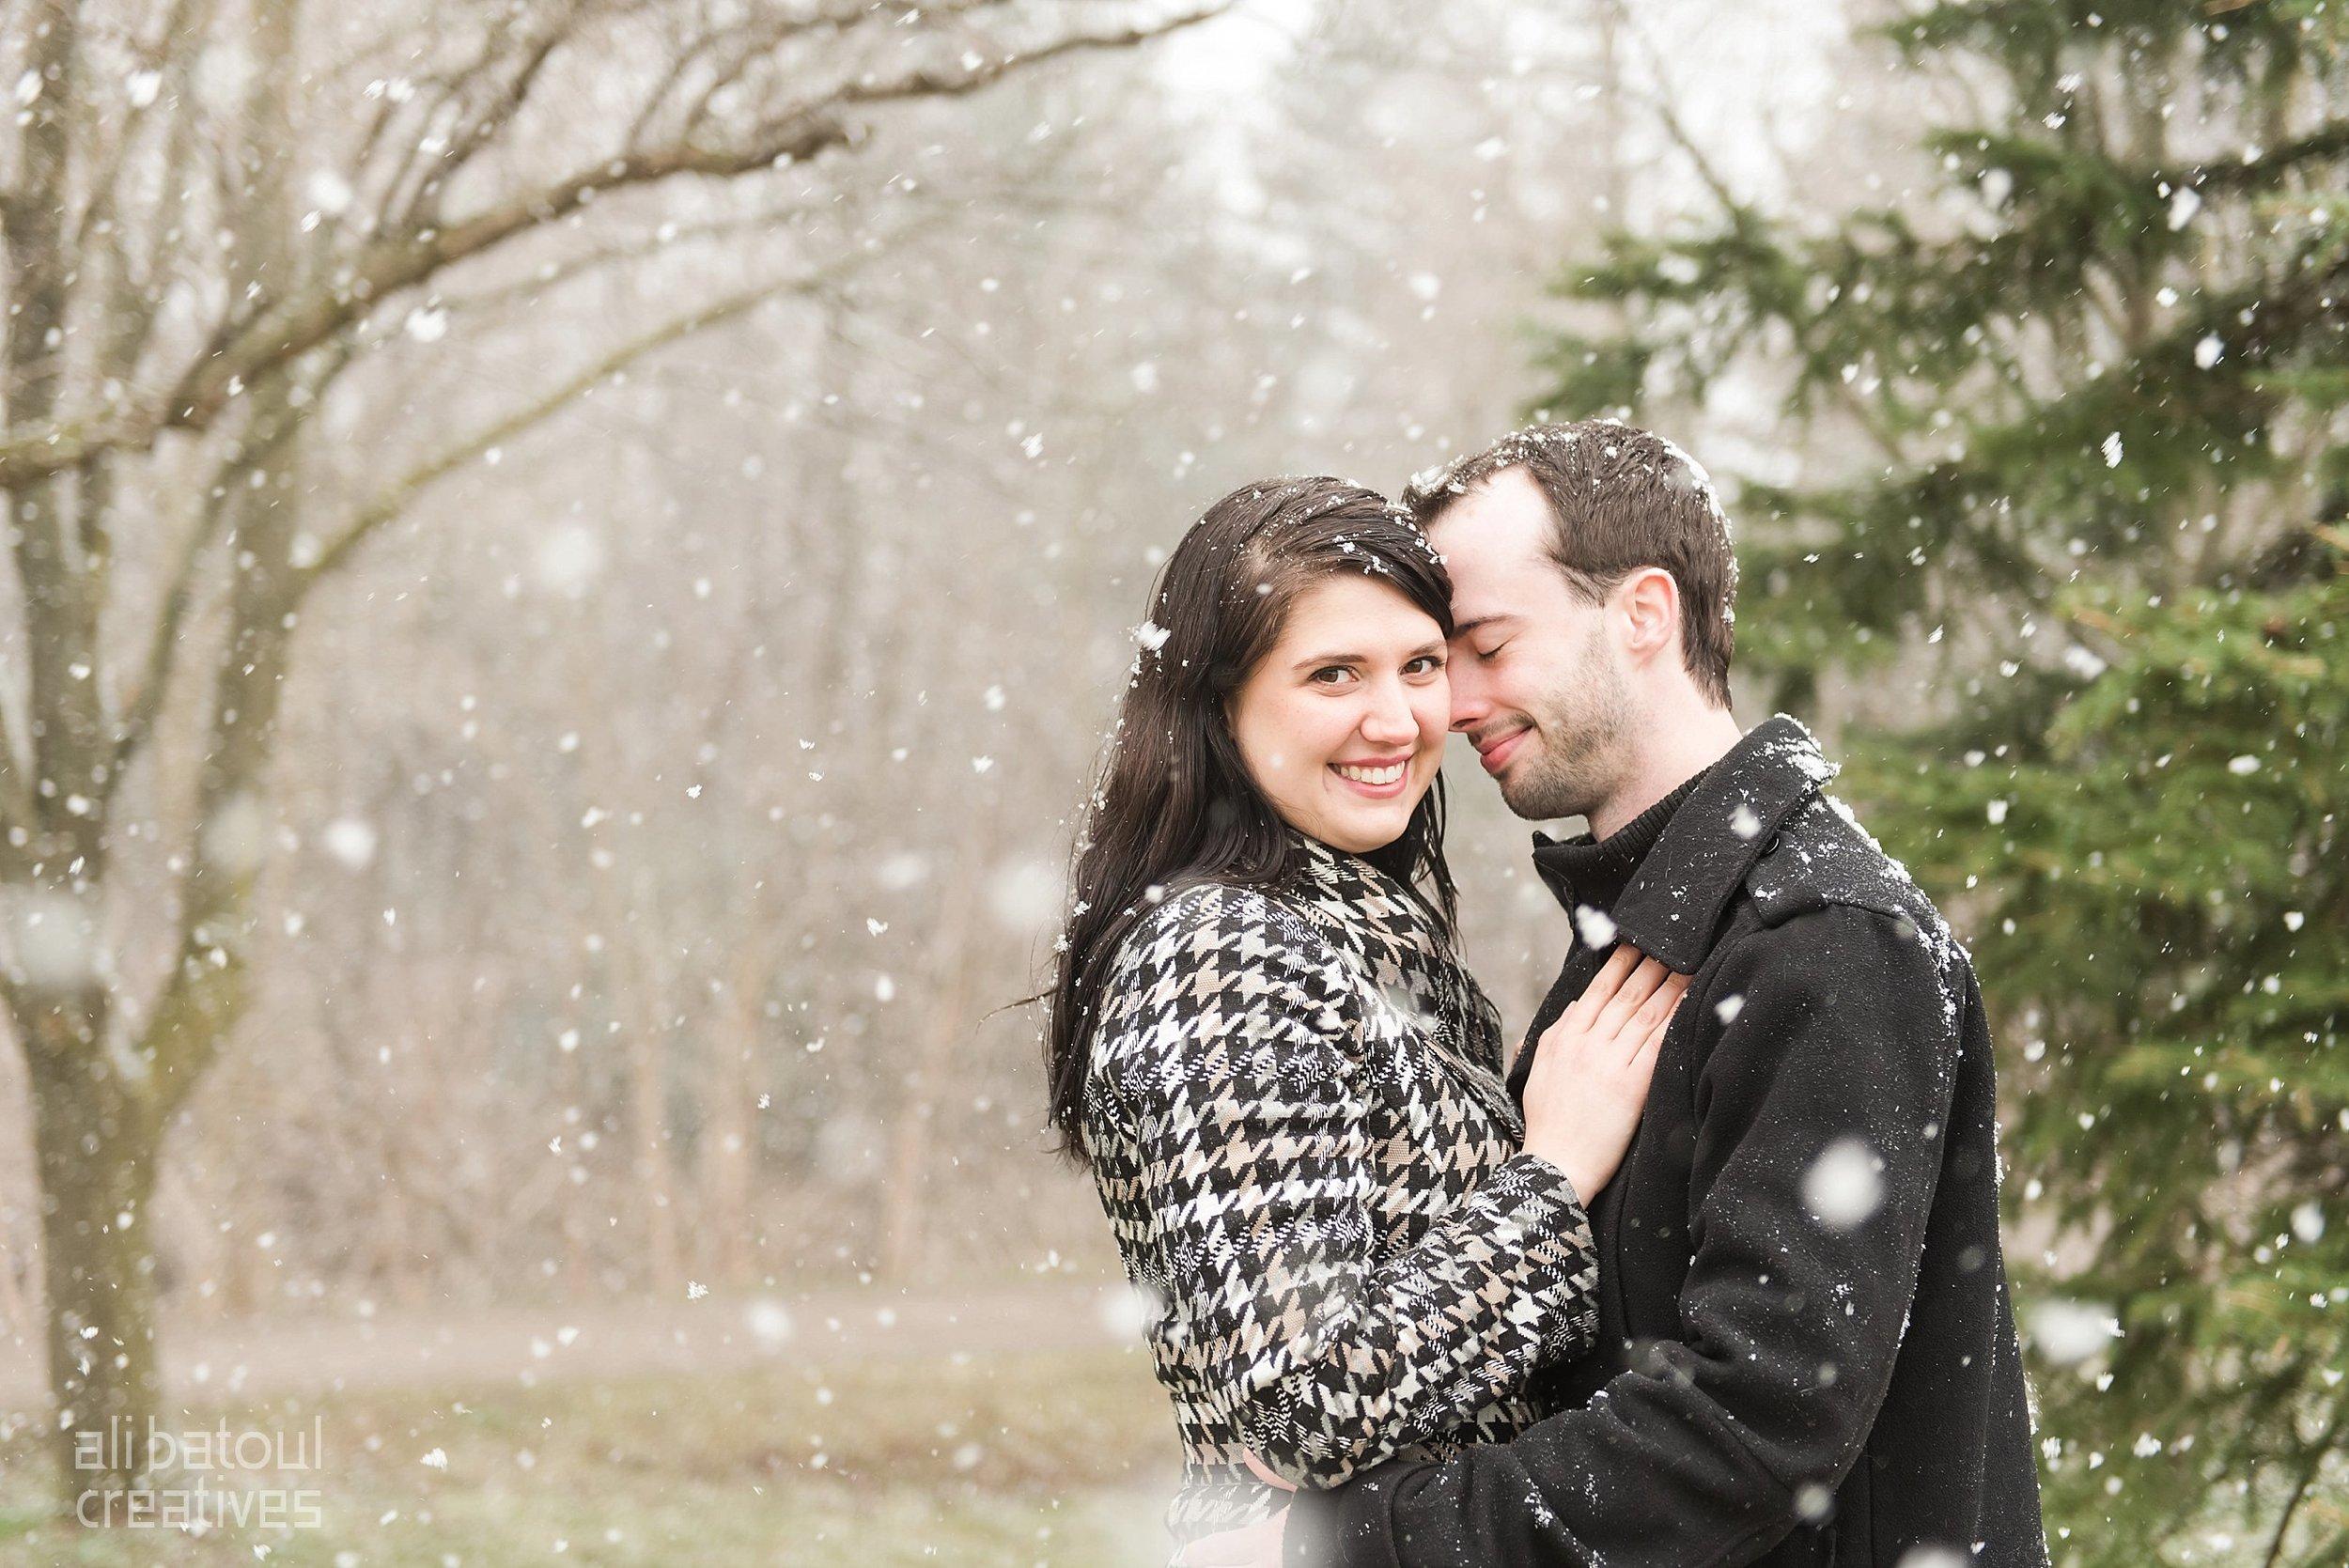 Ottawa Wedding Photography - Ali Batoul Creatives_0022.jpg